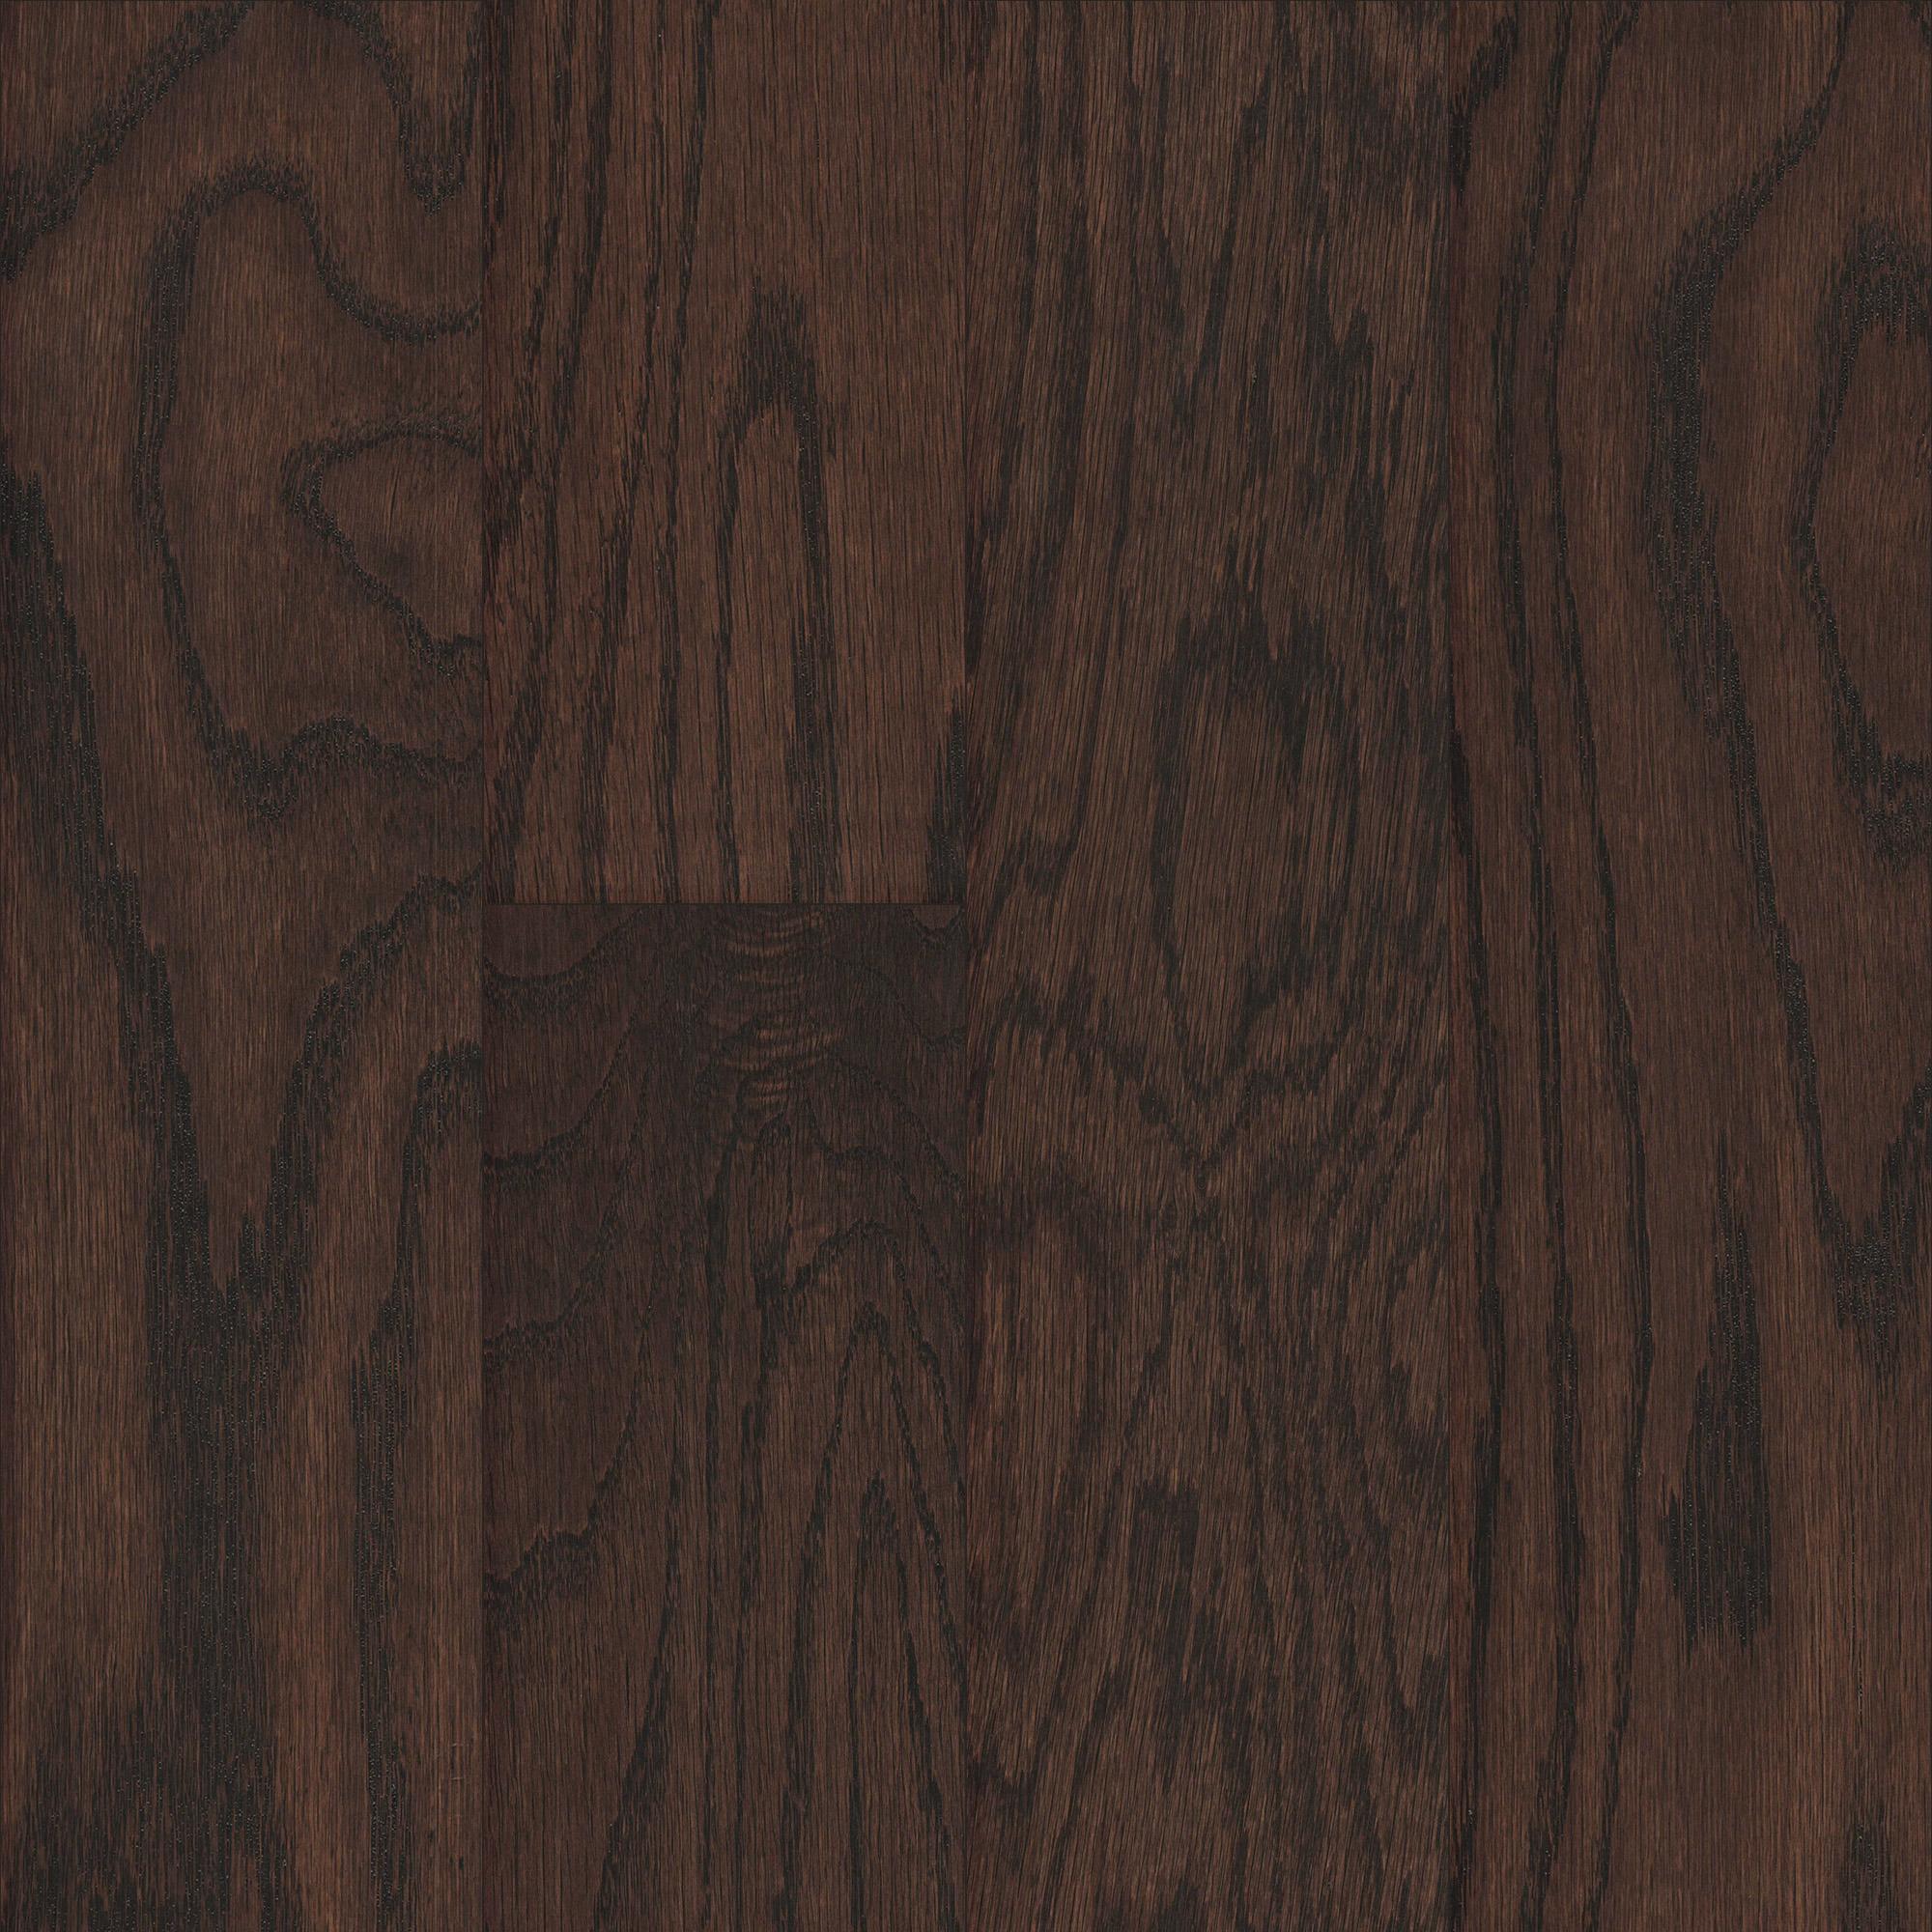 bamboo hardwood flooring vs oak of mullican ridgecrest oak burnt umber 1 2 thick 5 wide engineered within mullican ridgecrest oak burnt umber 1 2 thick 5 wide engineered hardwood flooring